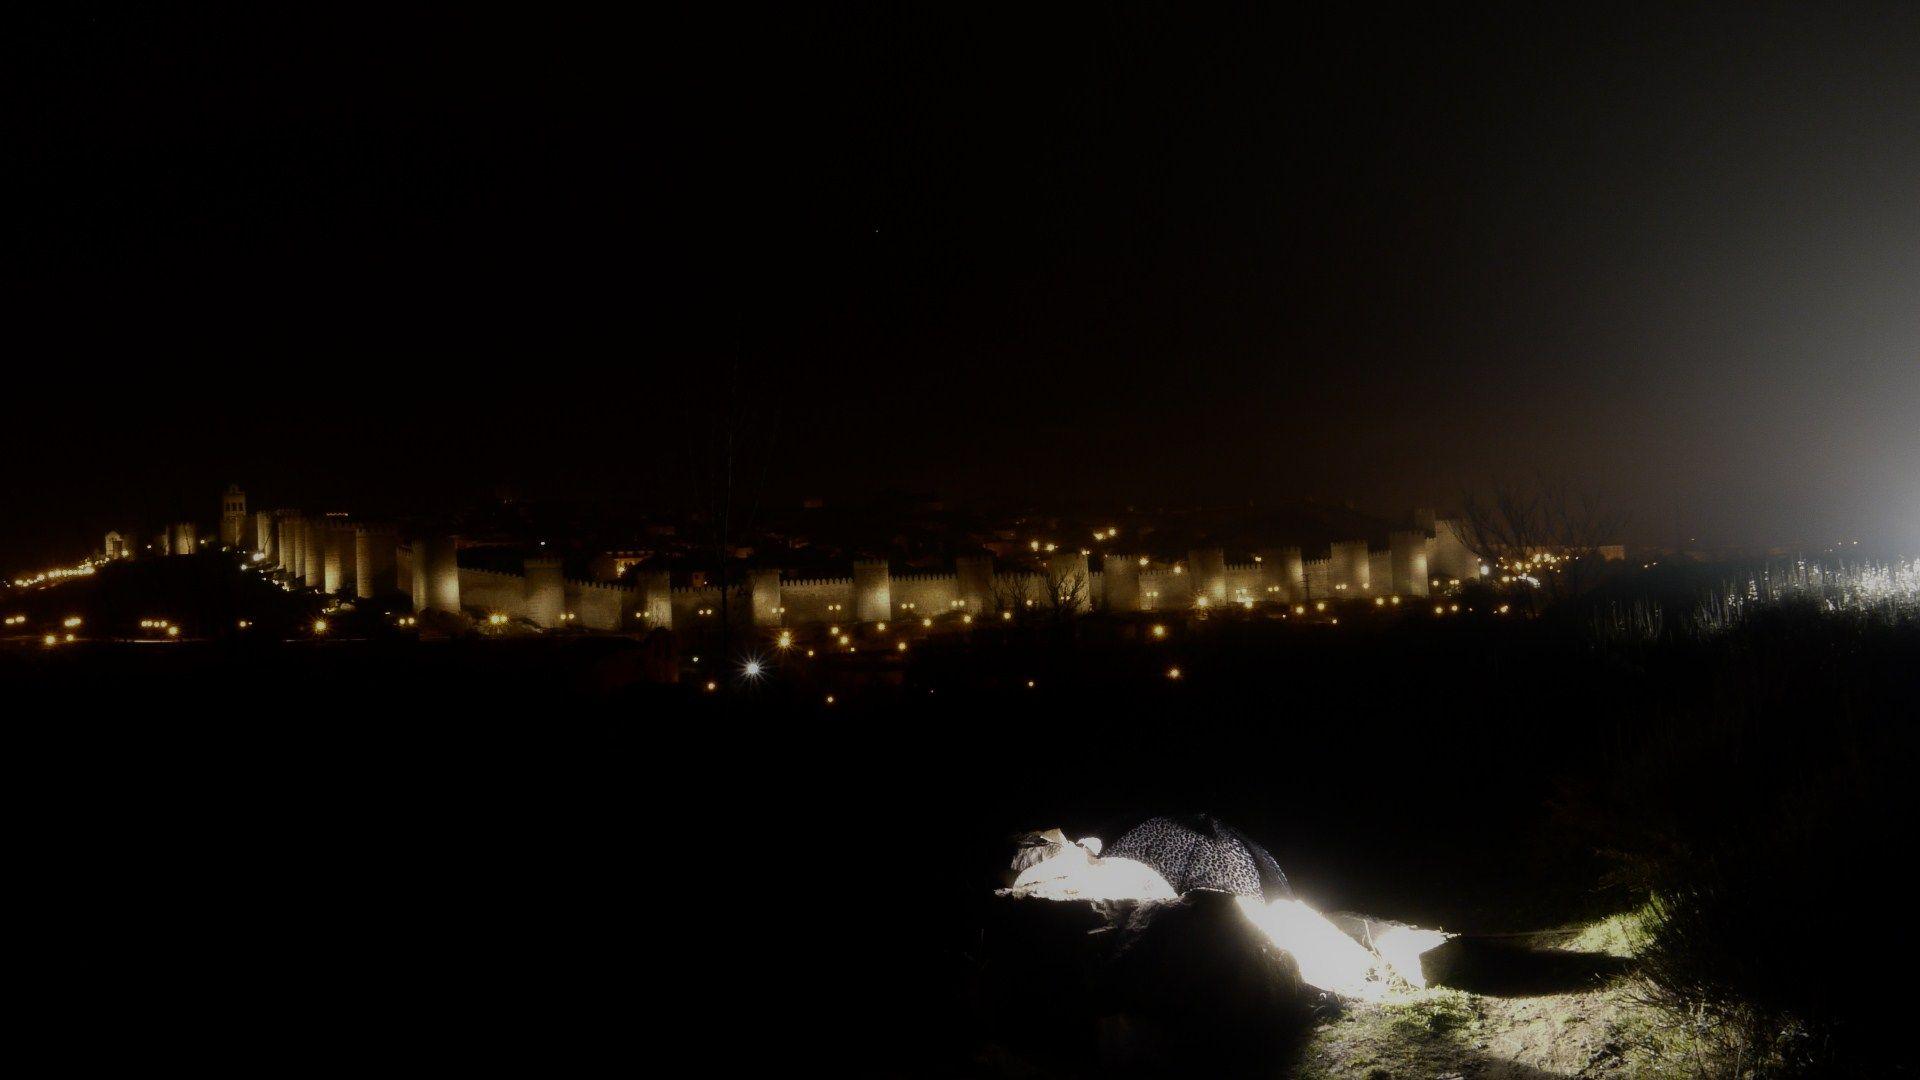 Noches únicas, Patrimonio de Avila.